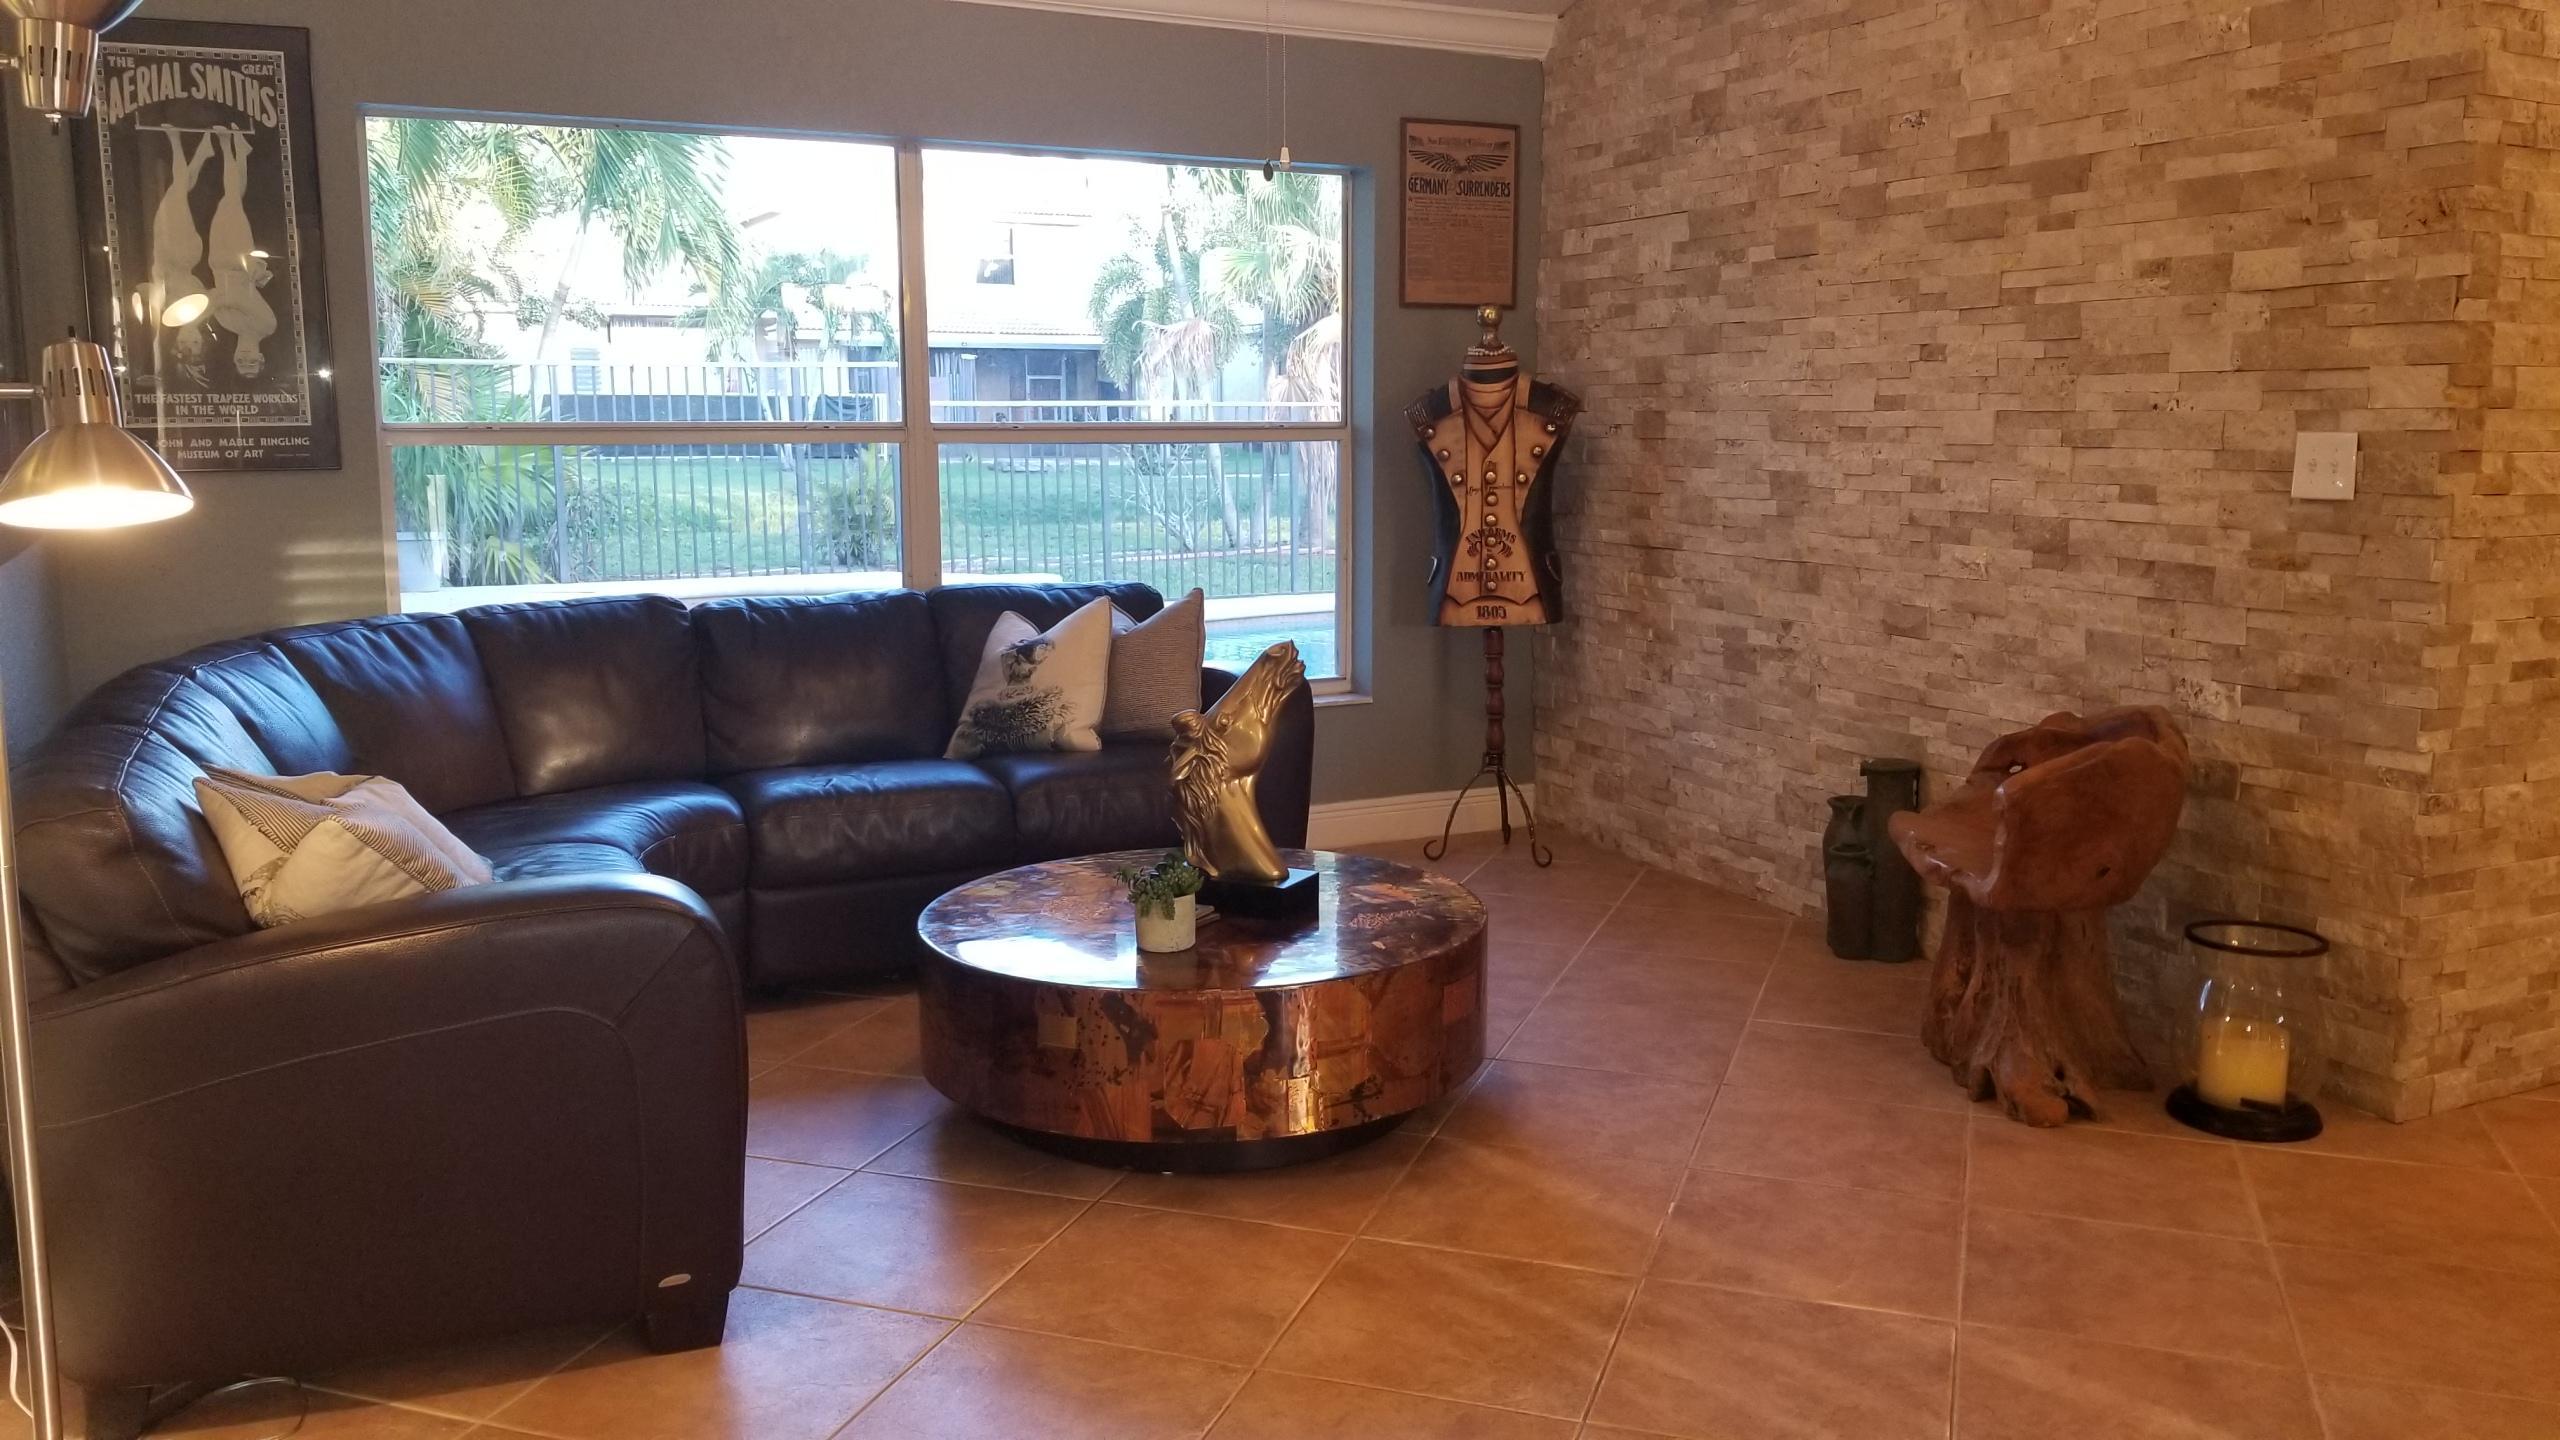 10903 Paso Fino Drive, Wellington, Florida 33449, 3 Bedrooms Bedrooms, ,2 BathroomsBathrooms,Rental,For Rent,Paso Fino,RX-10584155